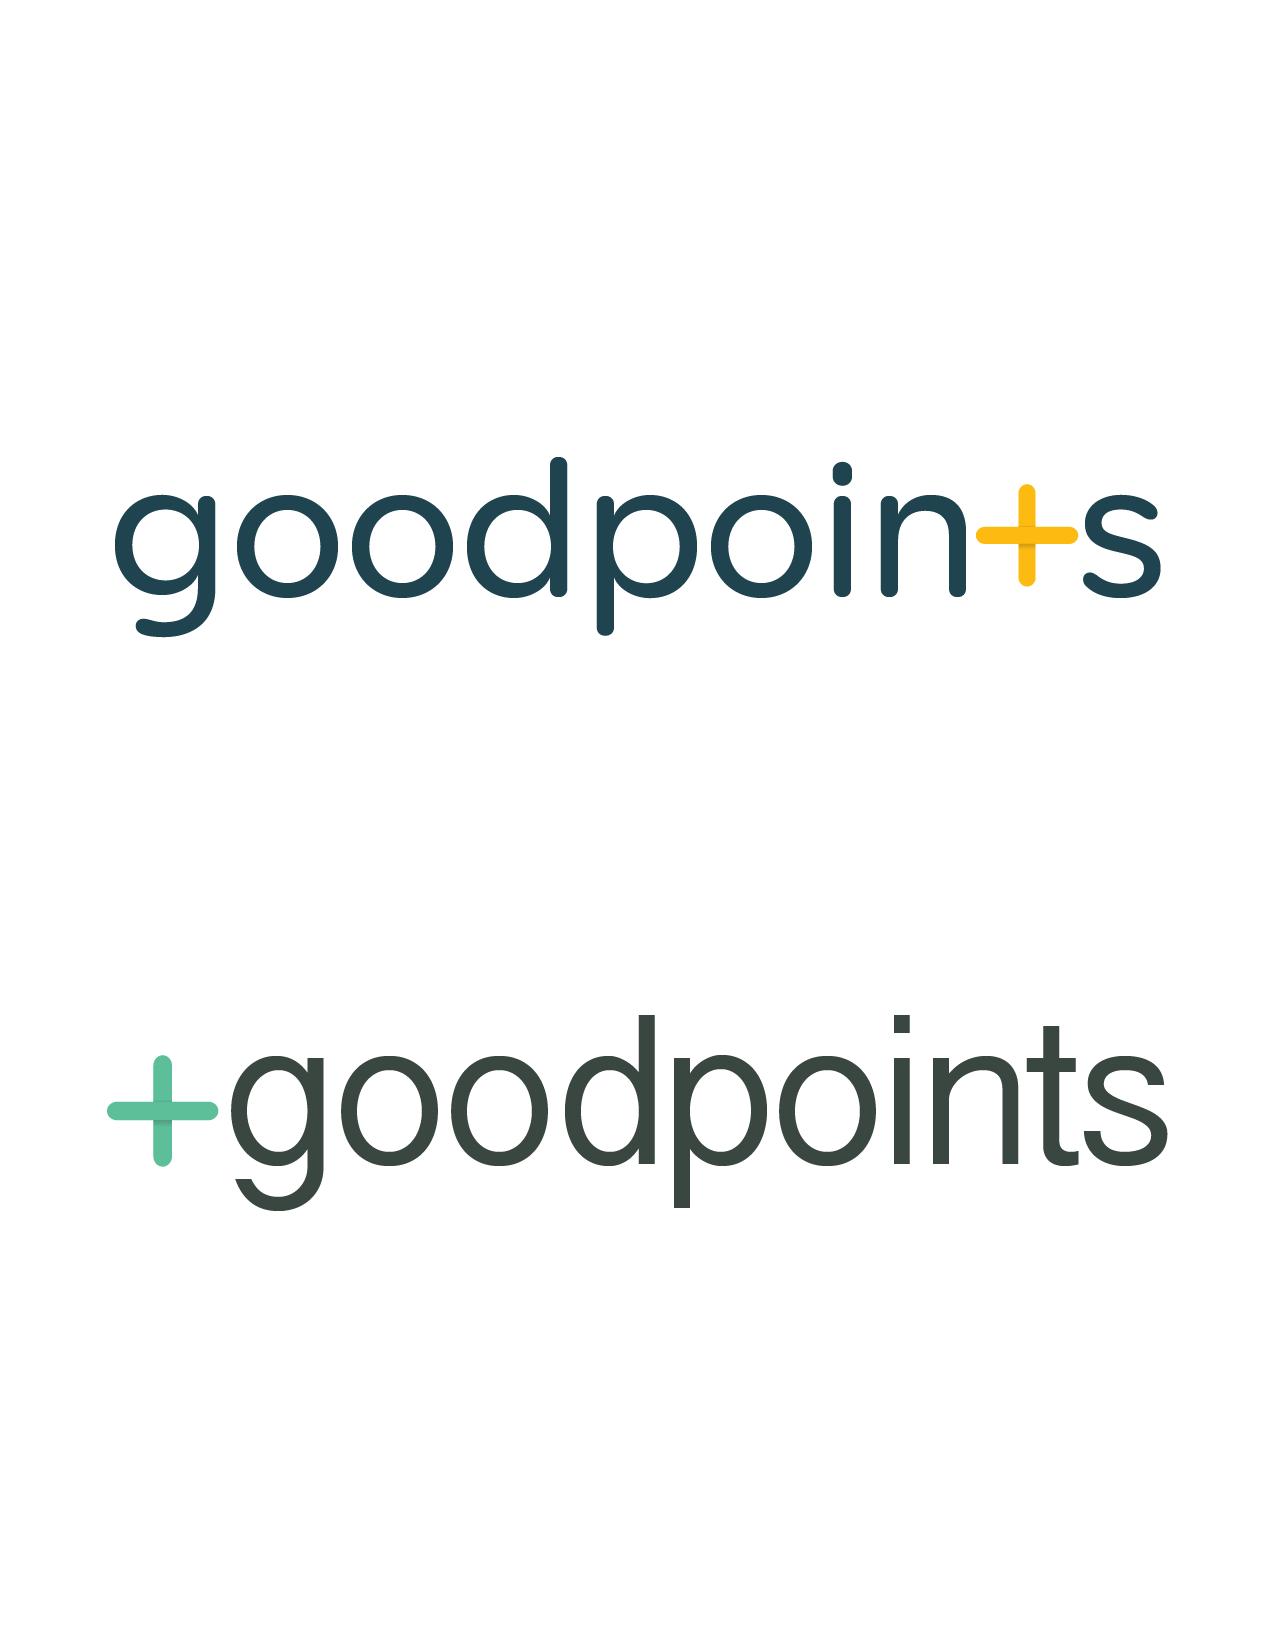 goodpoints_branding_06012016-01_favortites.png